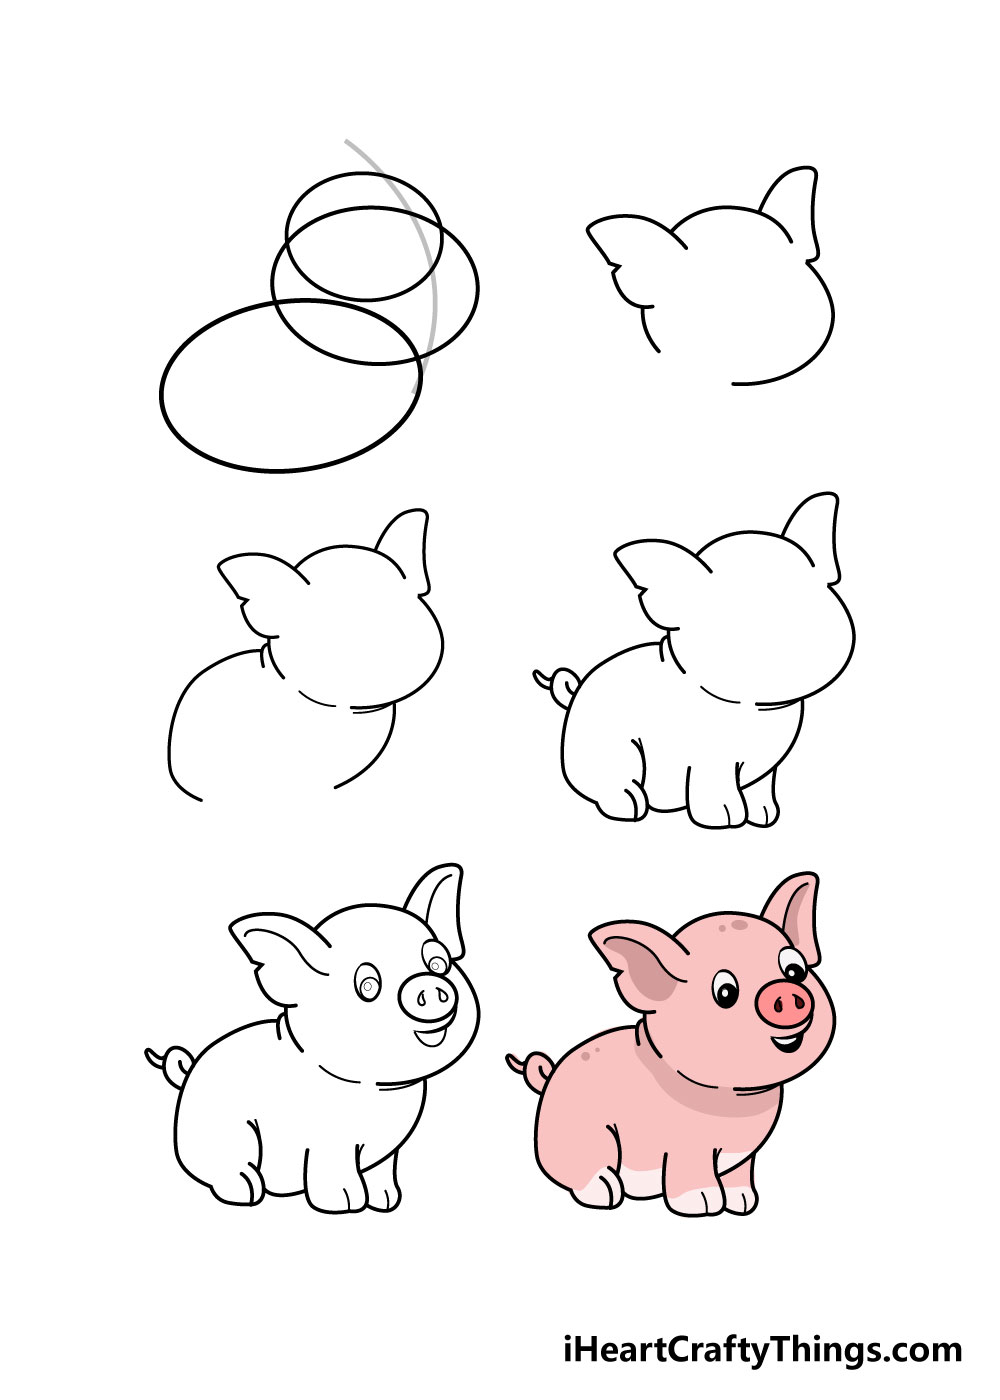 drawing pig in 6 steps